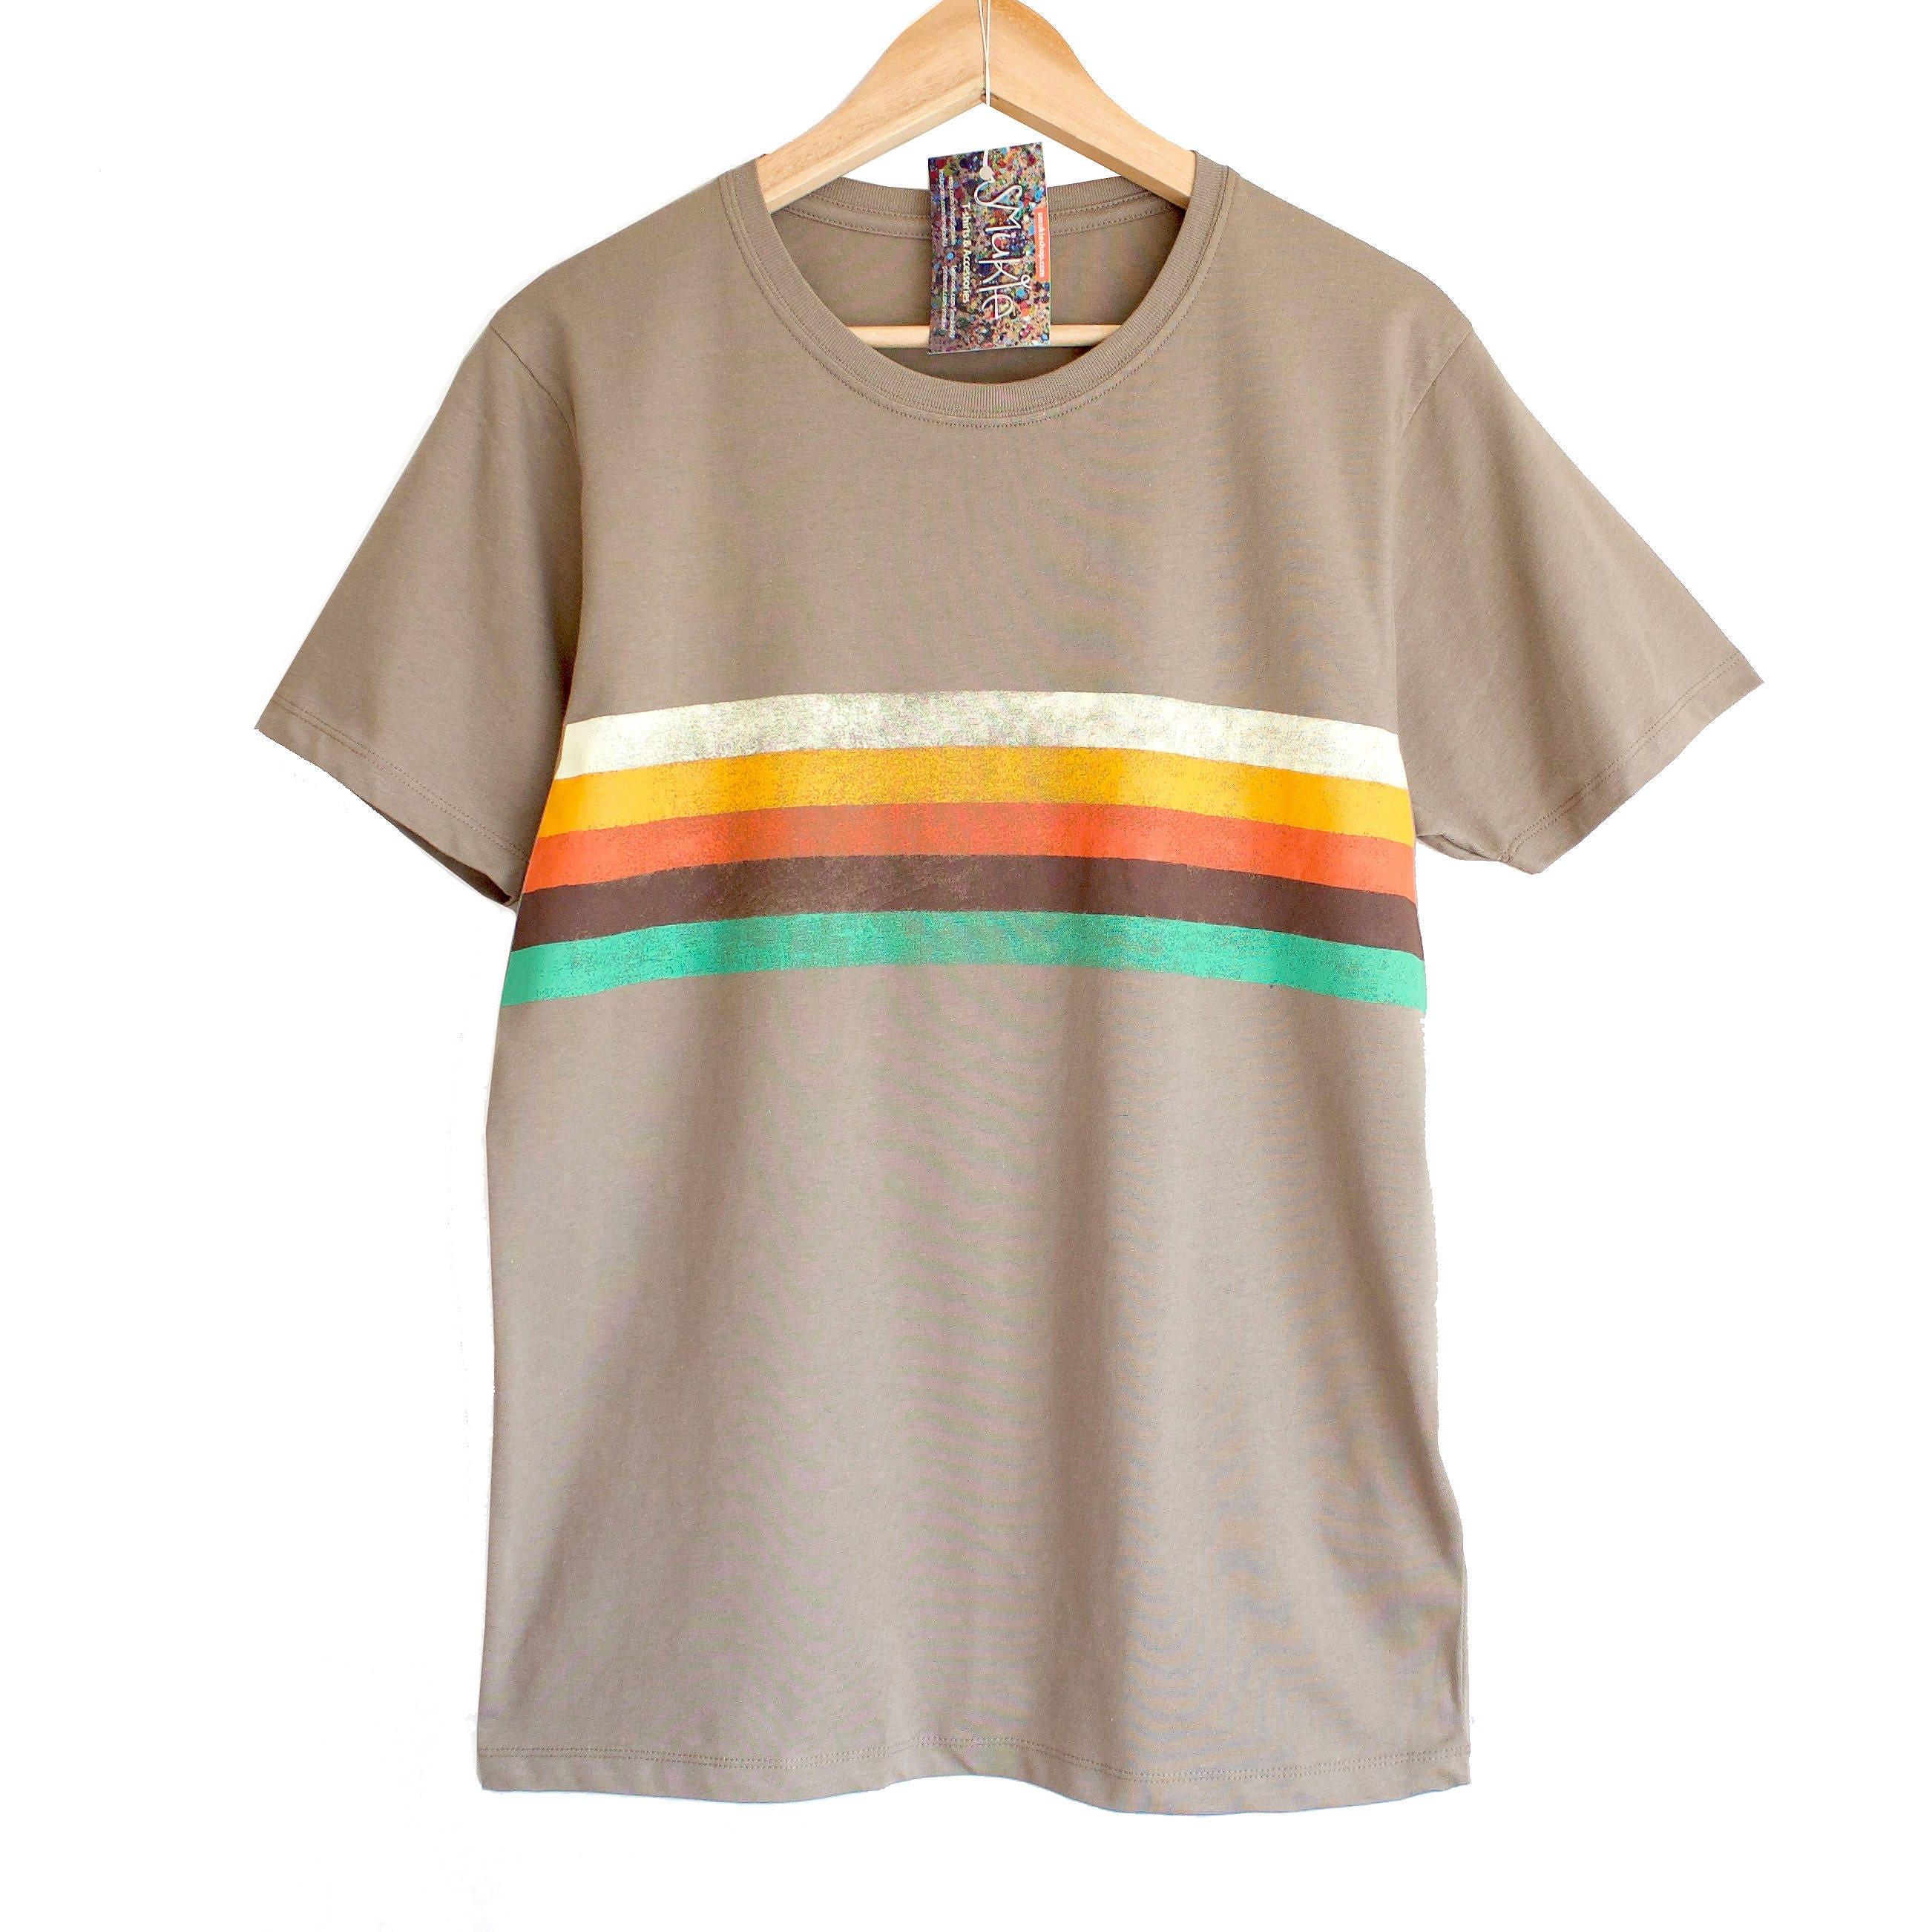 c4cf63405 RETRO STRIPES t shirt. 100% organic cotton t-shirt. Hand printed. Khaki  beige shirt. Retro colours. Rainbow t-shirt